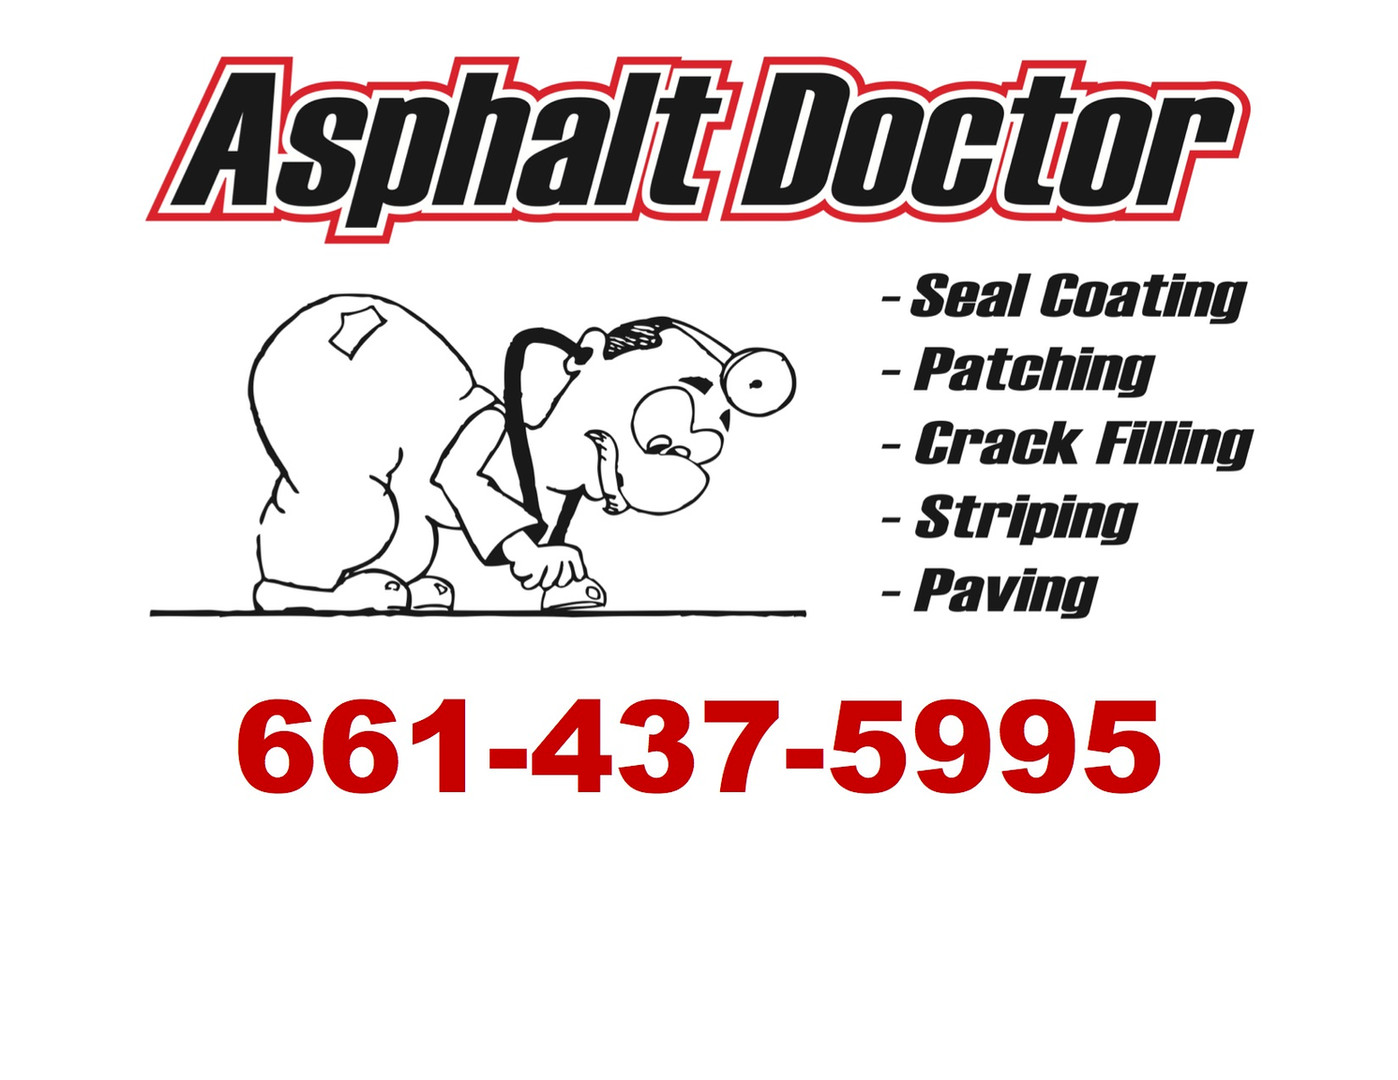 Asphalt Dr. LLC logo (2).jpg